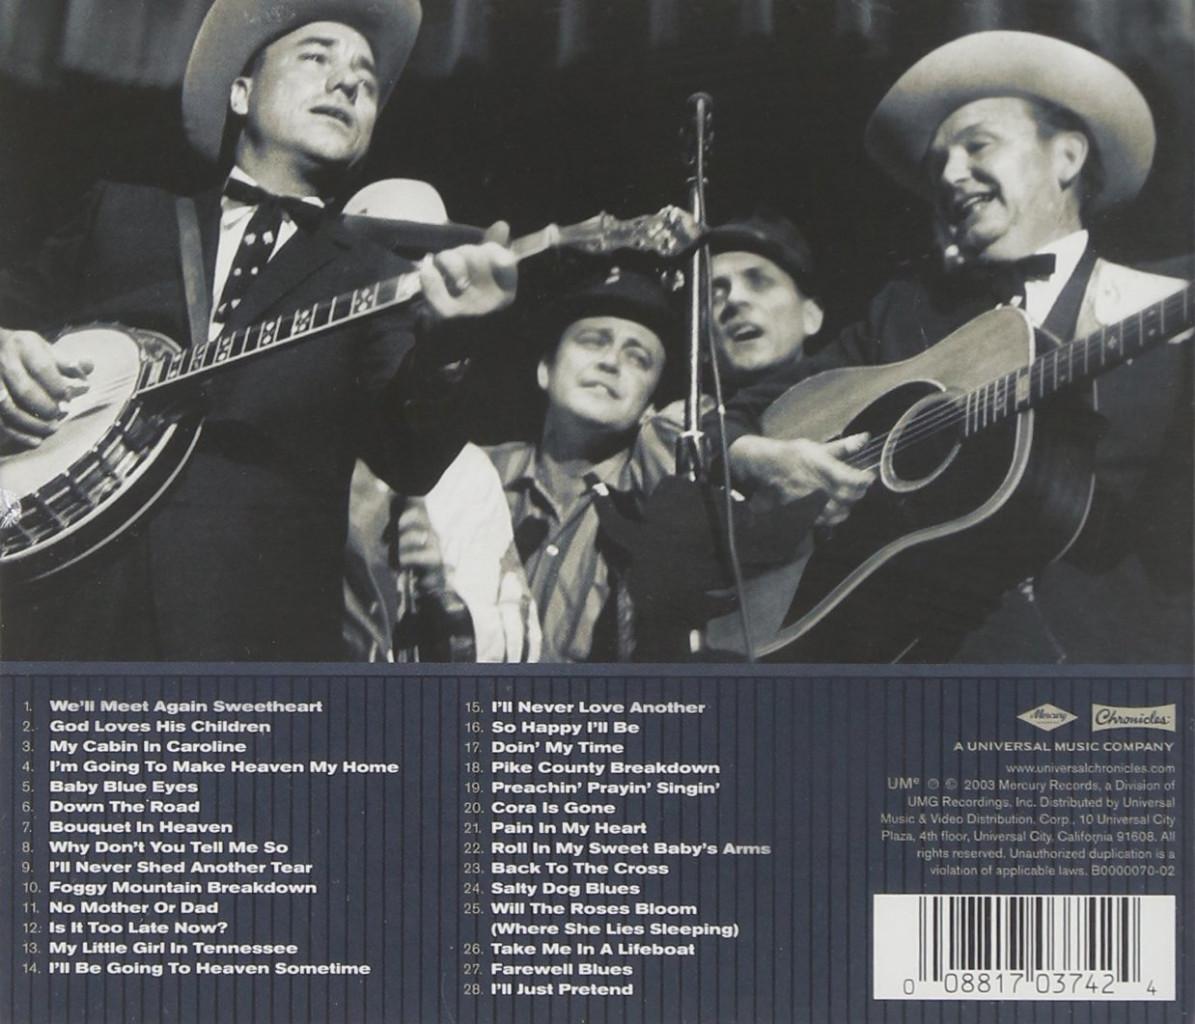 Image 1 of Complete Mercury Recordings